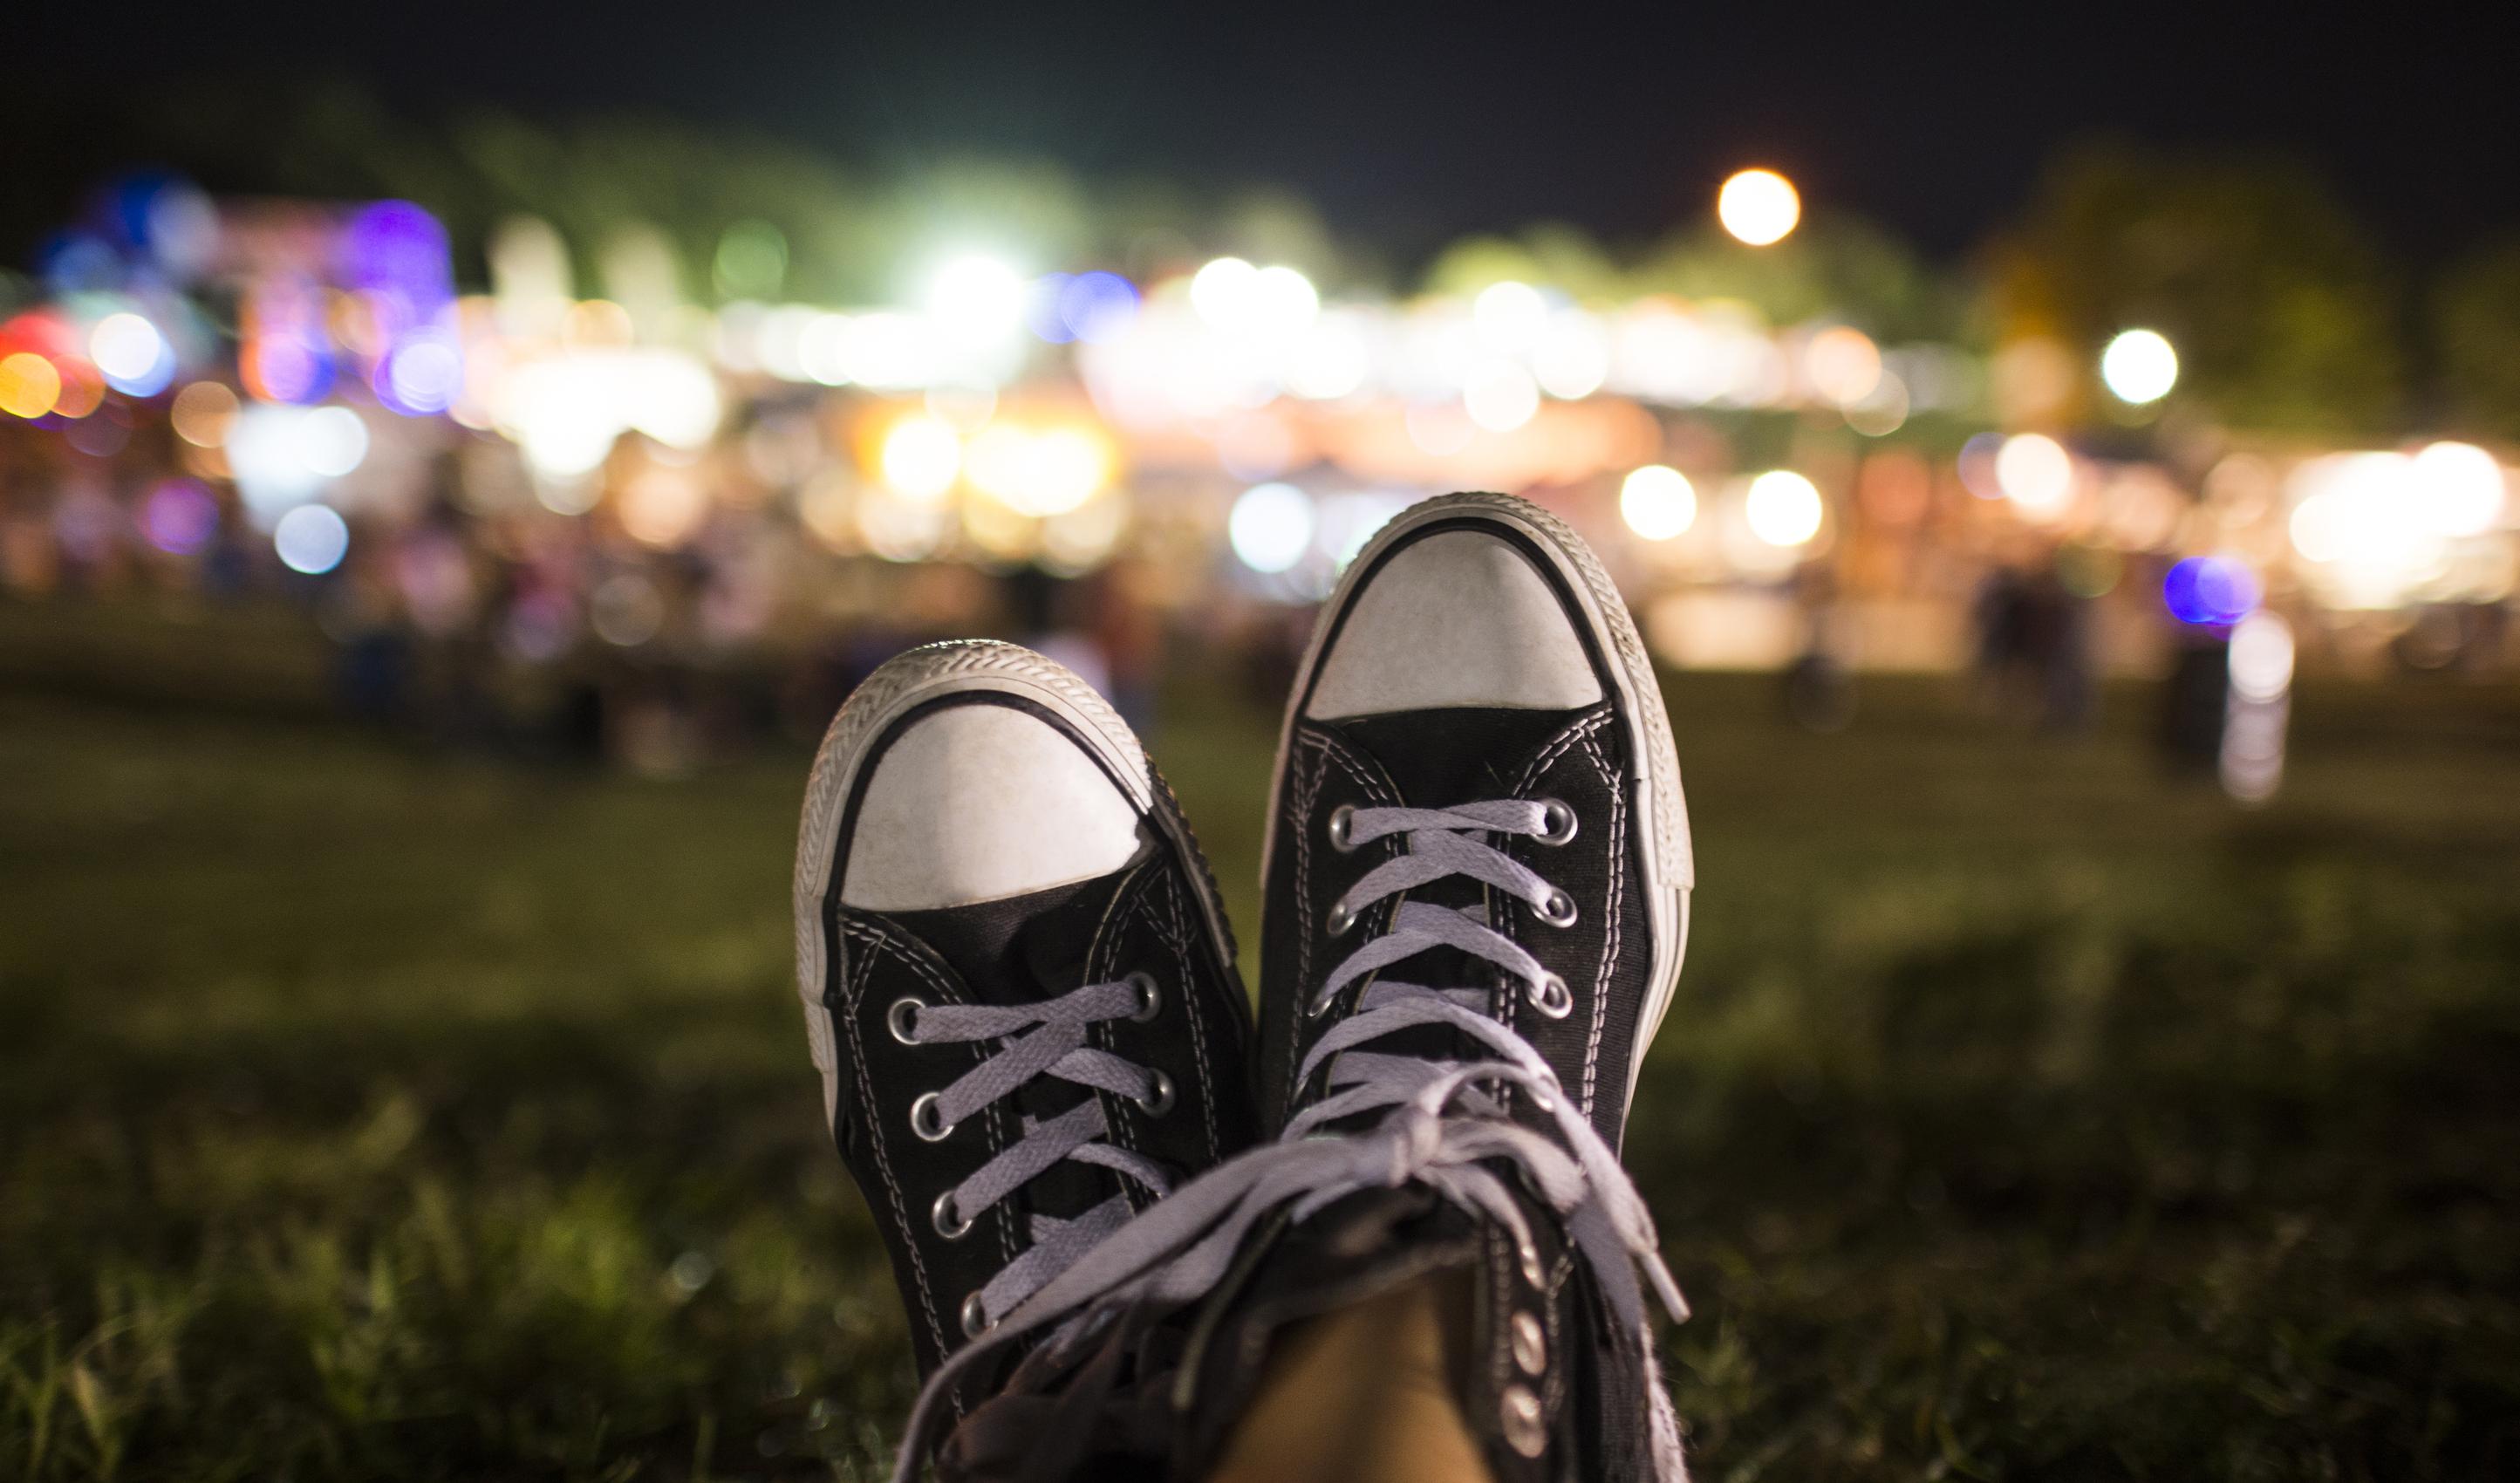 Relaxing at an evening festival